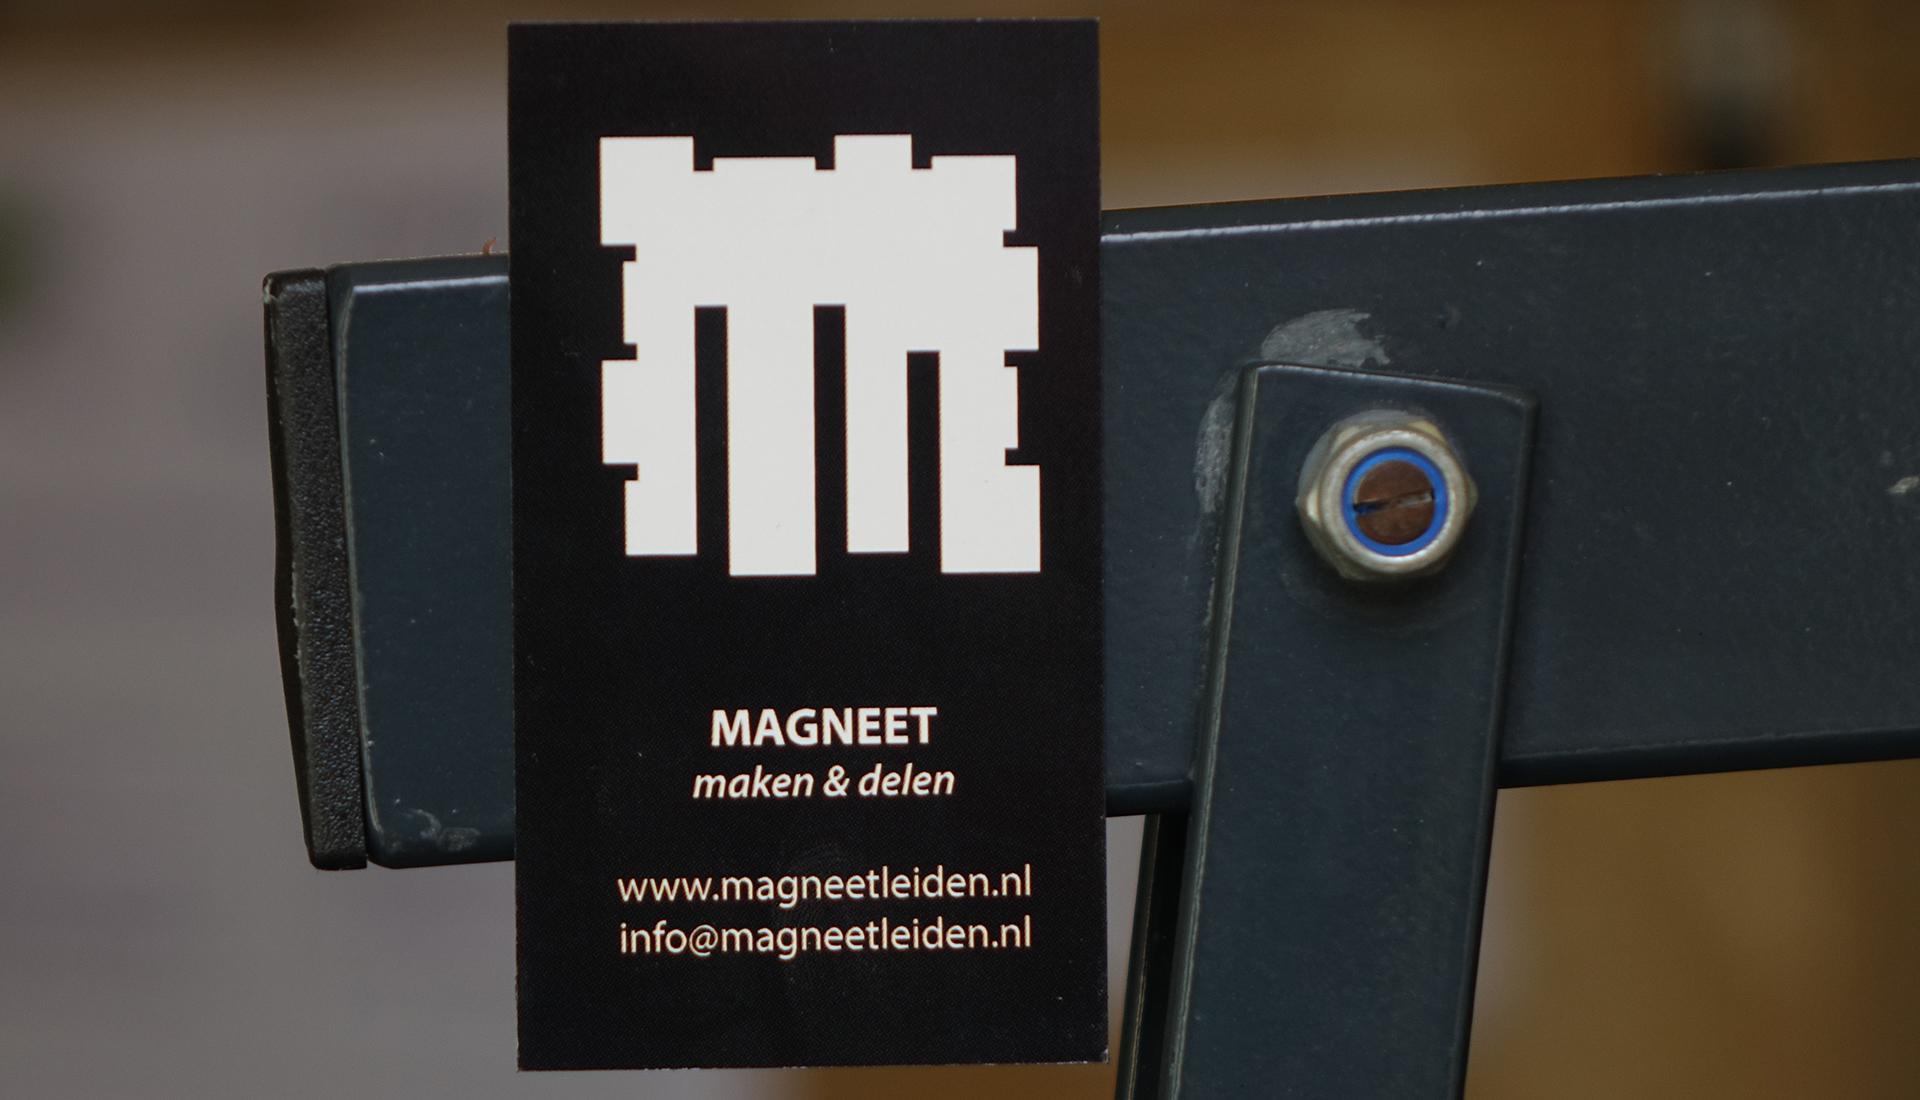 WHNL_Magneet_web-01